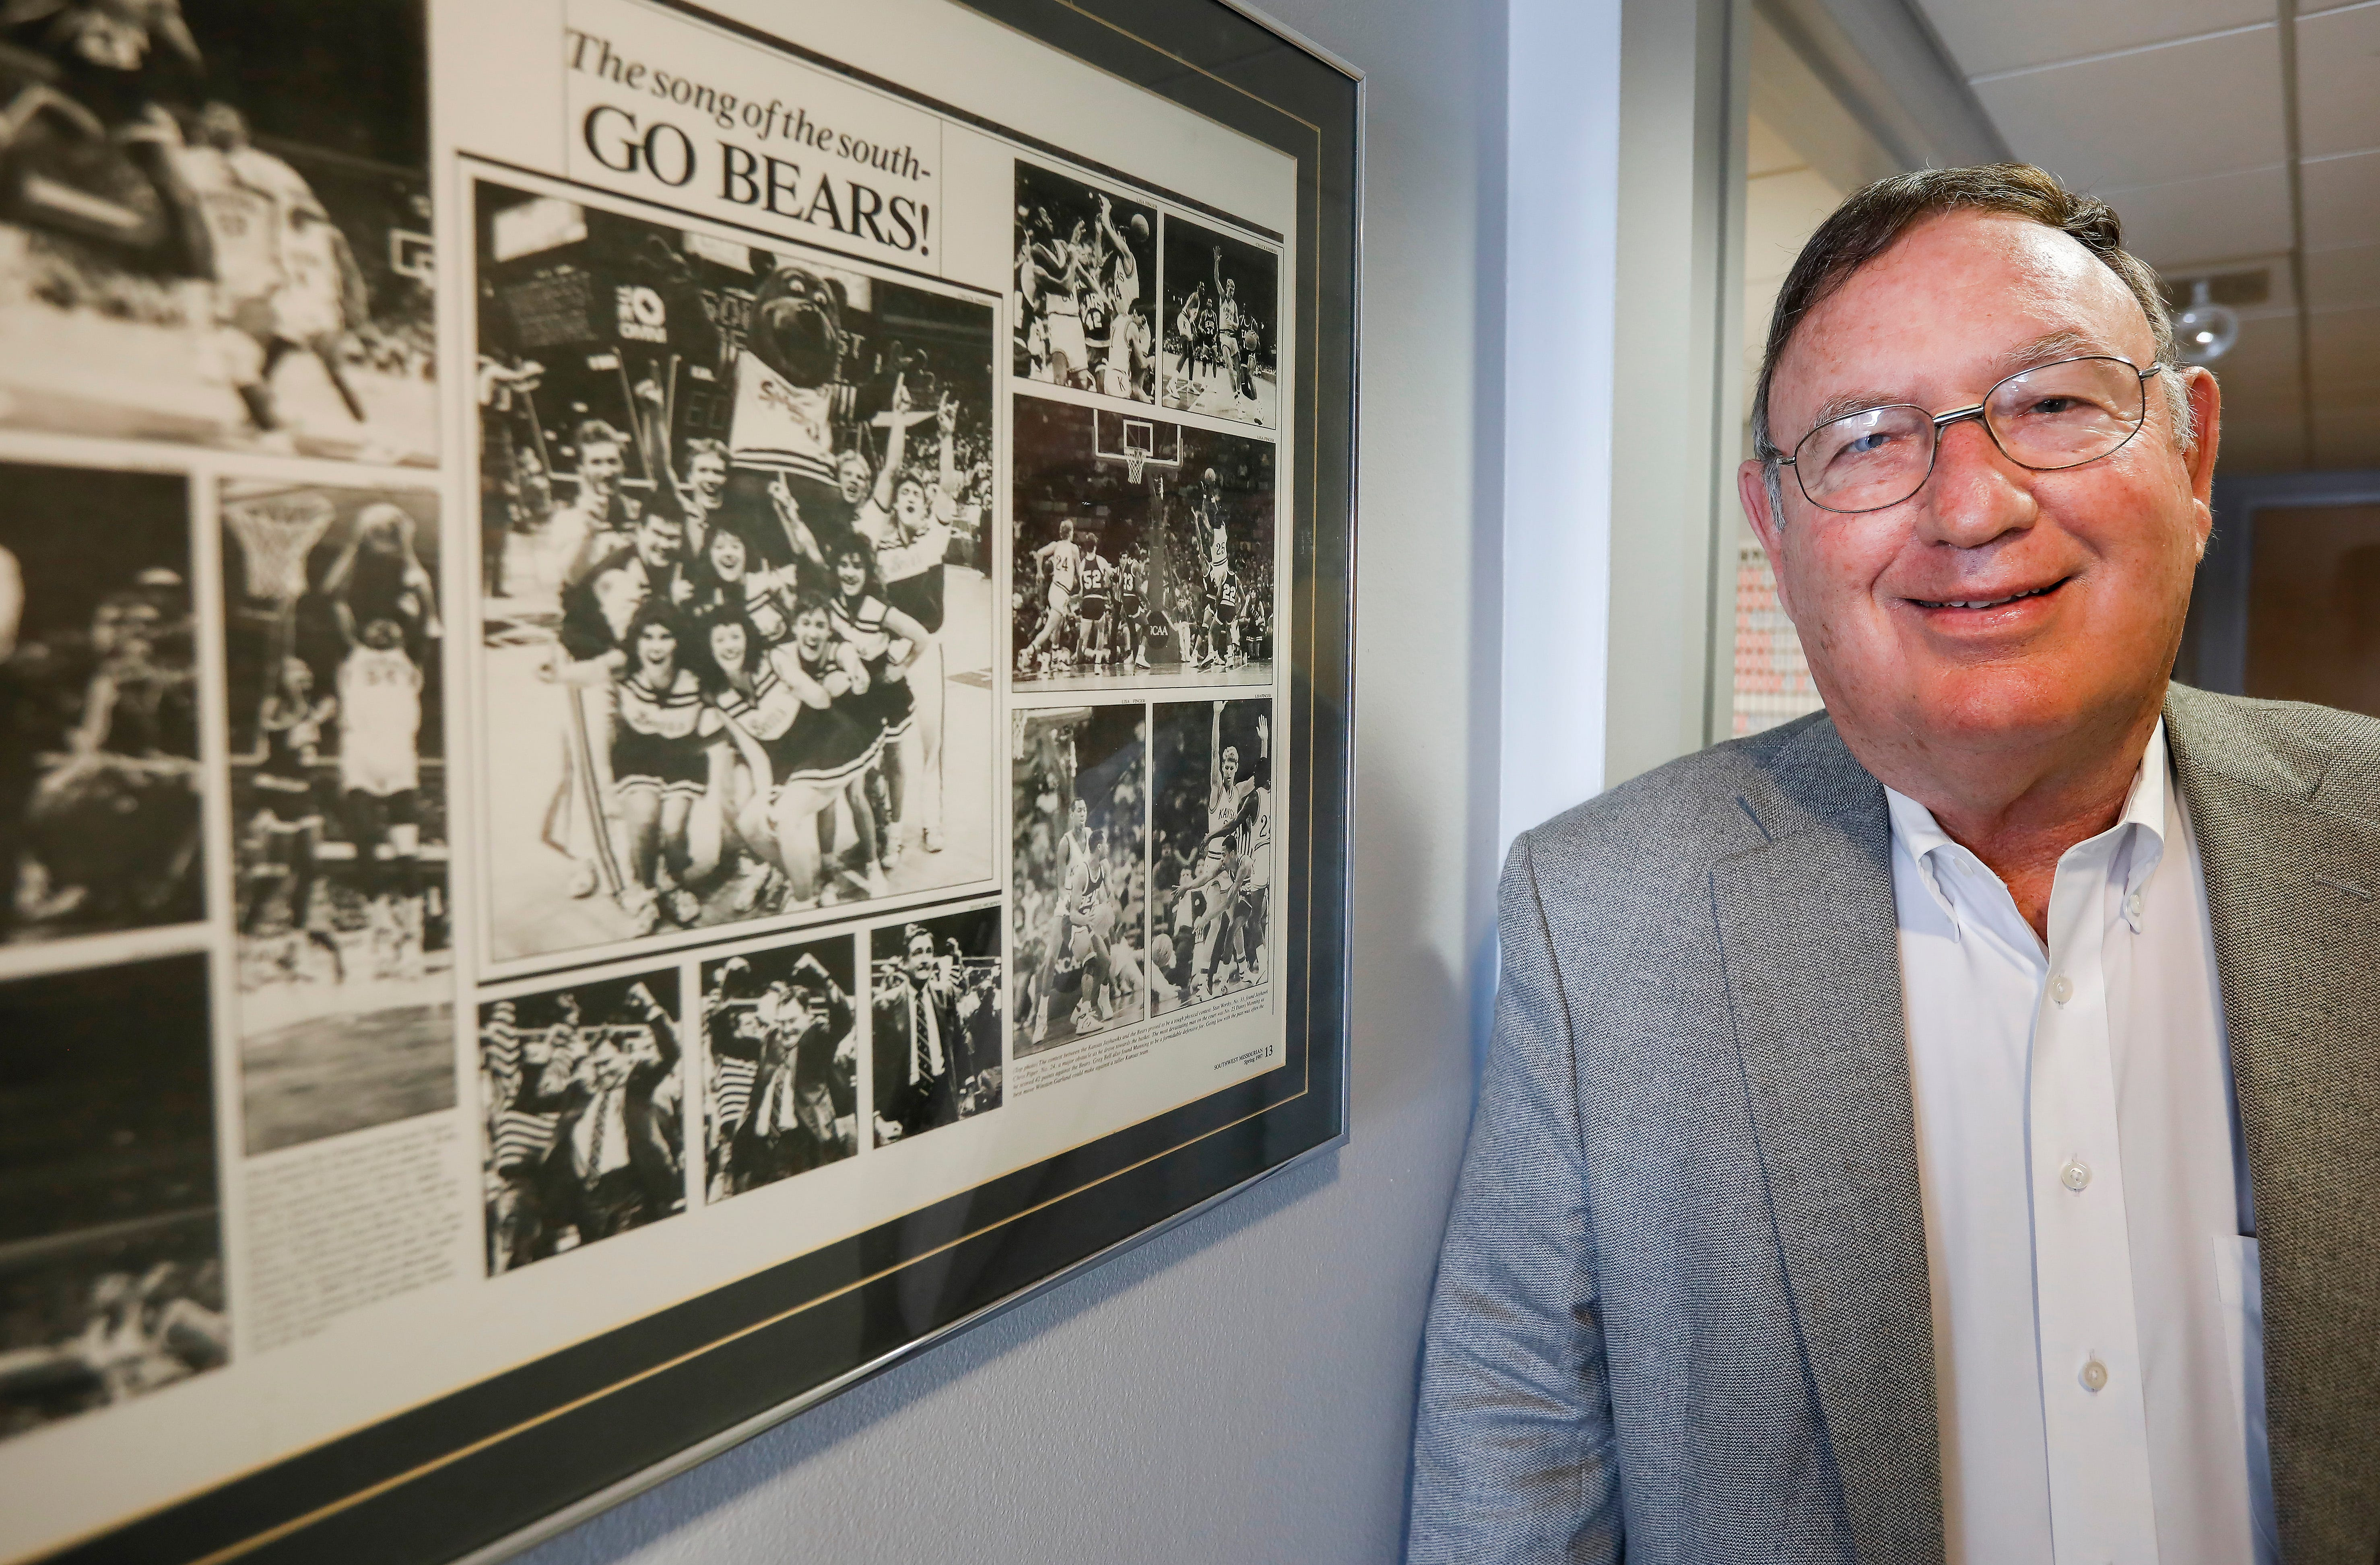 Ed Pinegar is looking forward to the new MSU basketball season.